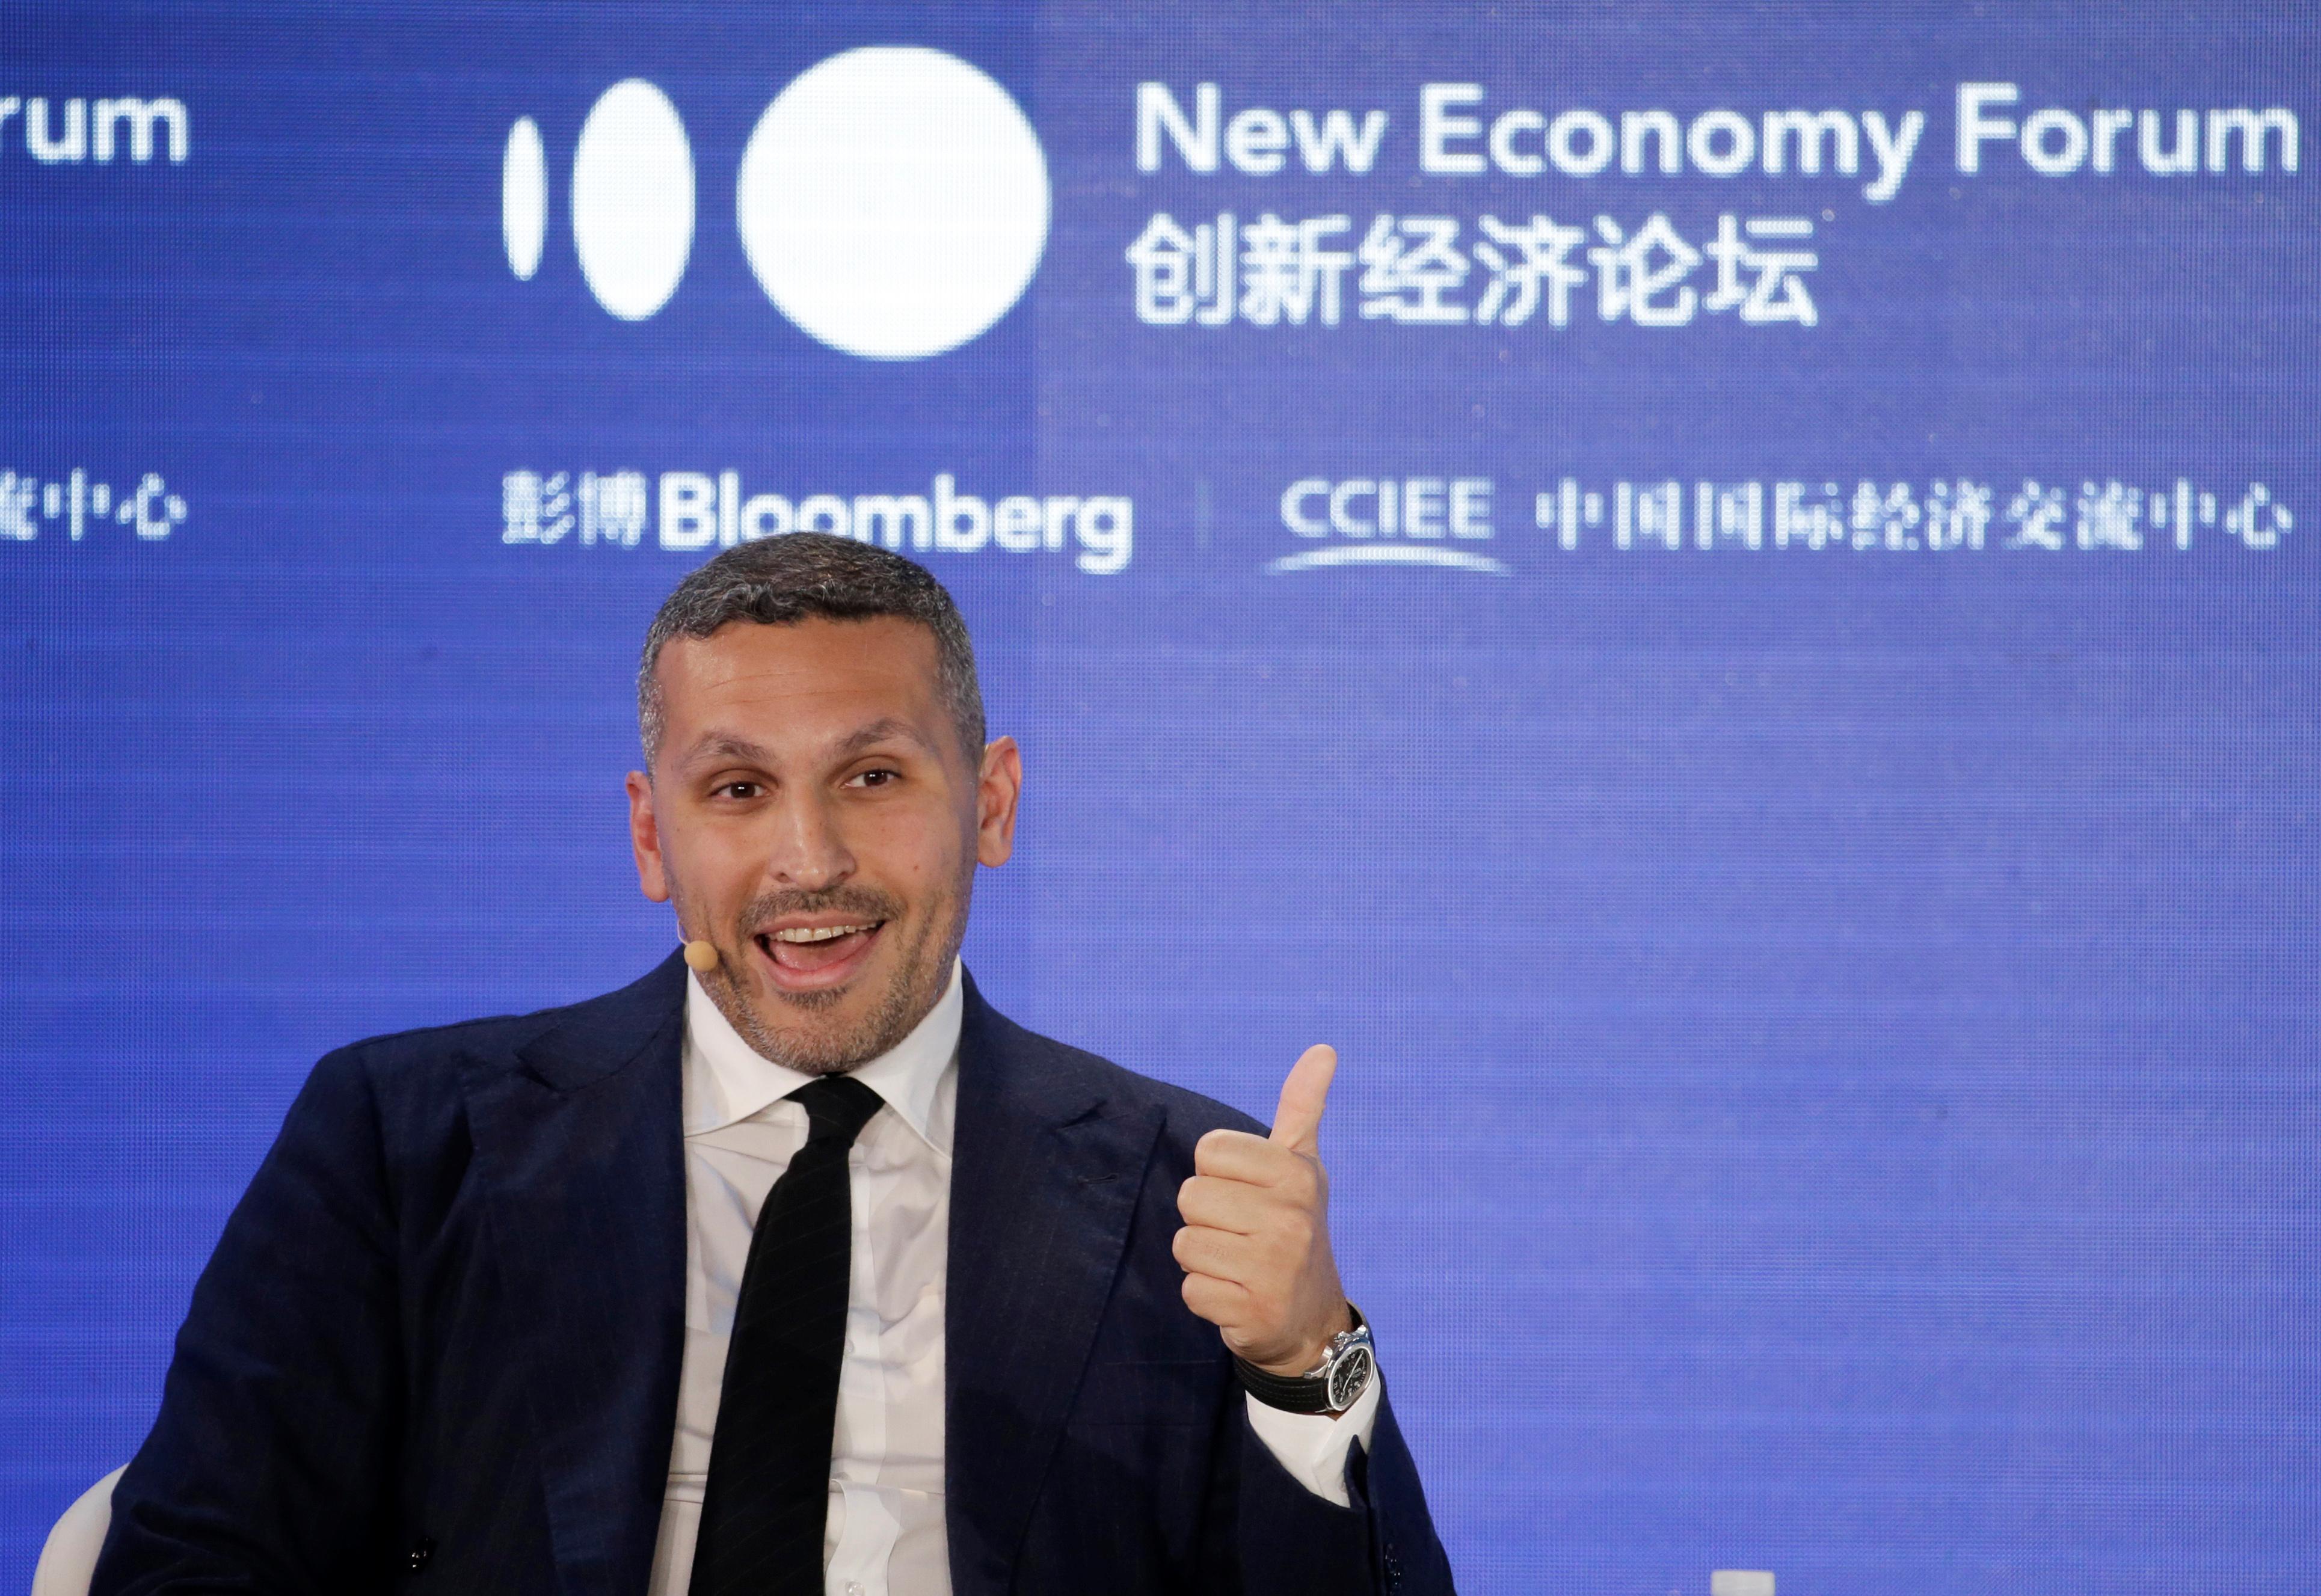 Khaldoon Khalifa Al Mubarak, group chief executive officer of Mubadala Investment Company, speaks at the 2019 New Economy Forum in Beijing, China November 21, 2019. REUTERS/Jason Lee